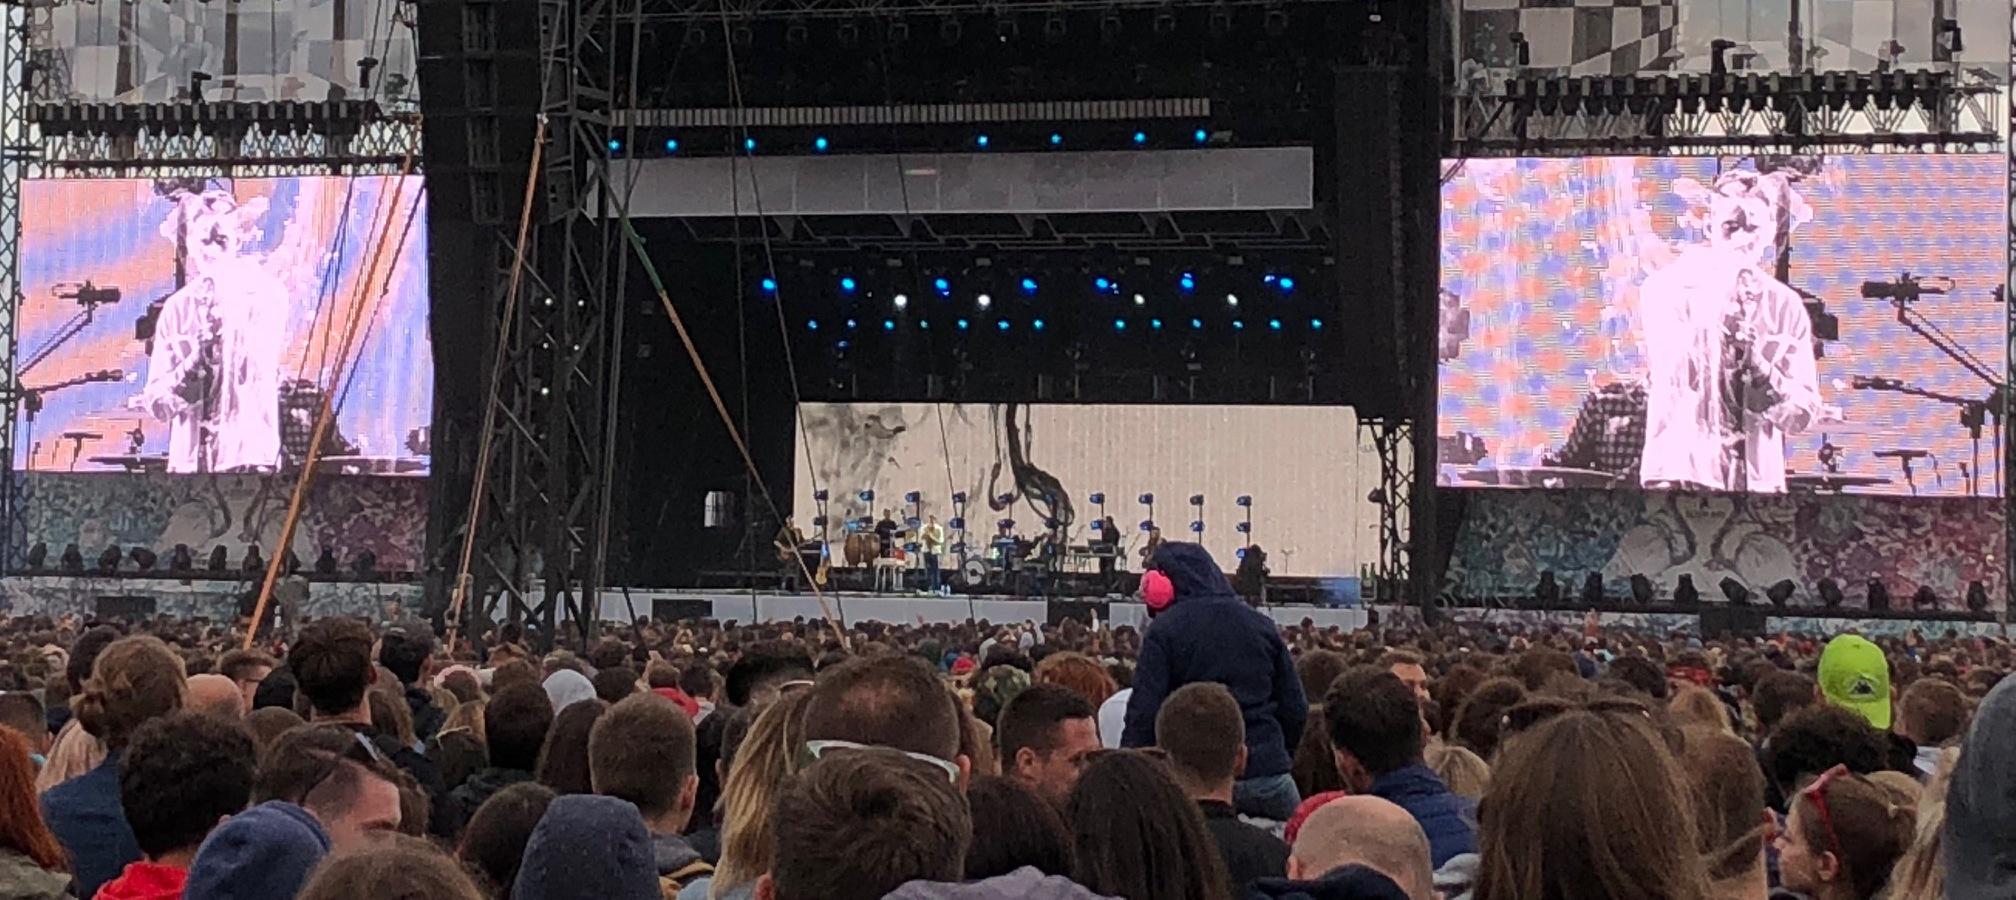 Opener: Bass Astral x Igo Orchestra, Dawid Podsiadło, Bruno Mars